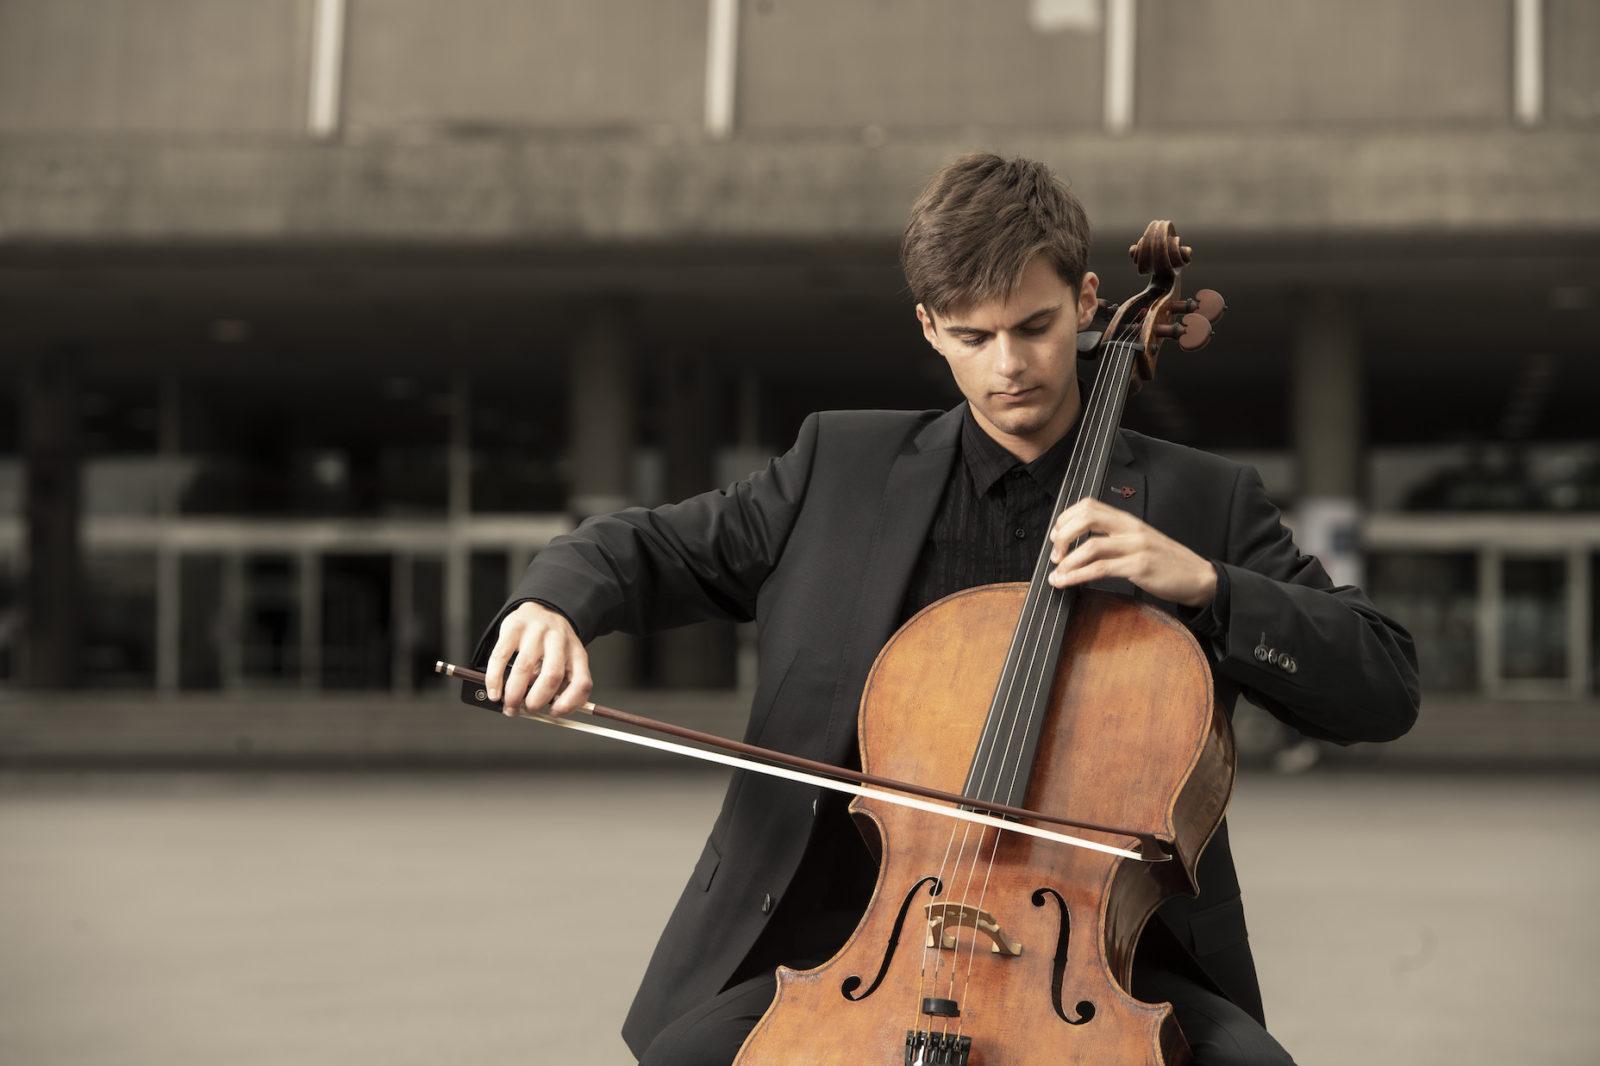 Samuel Niederhauser